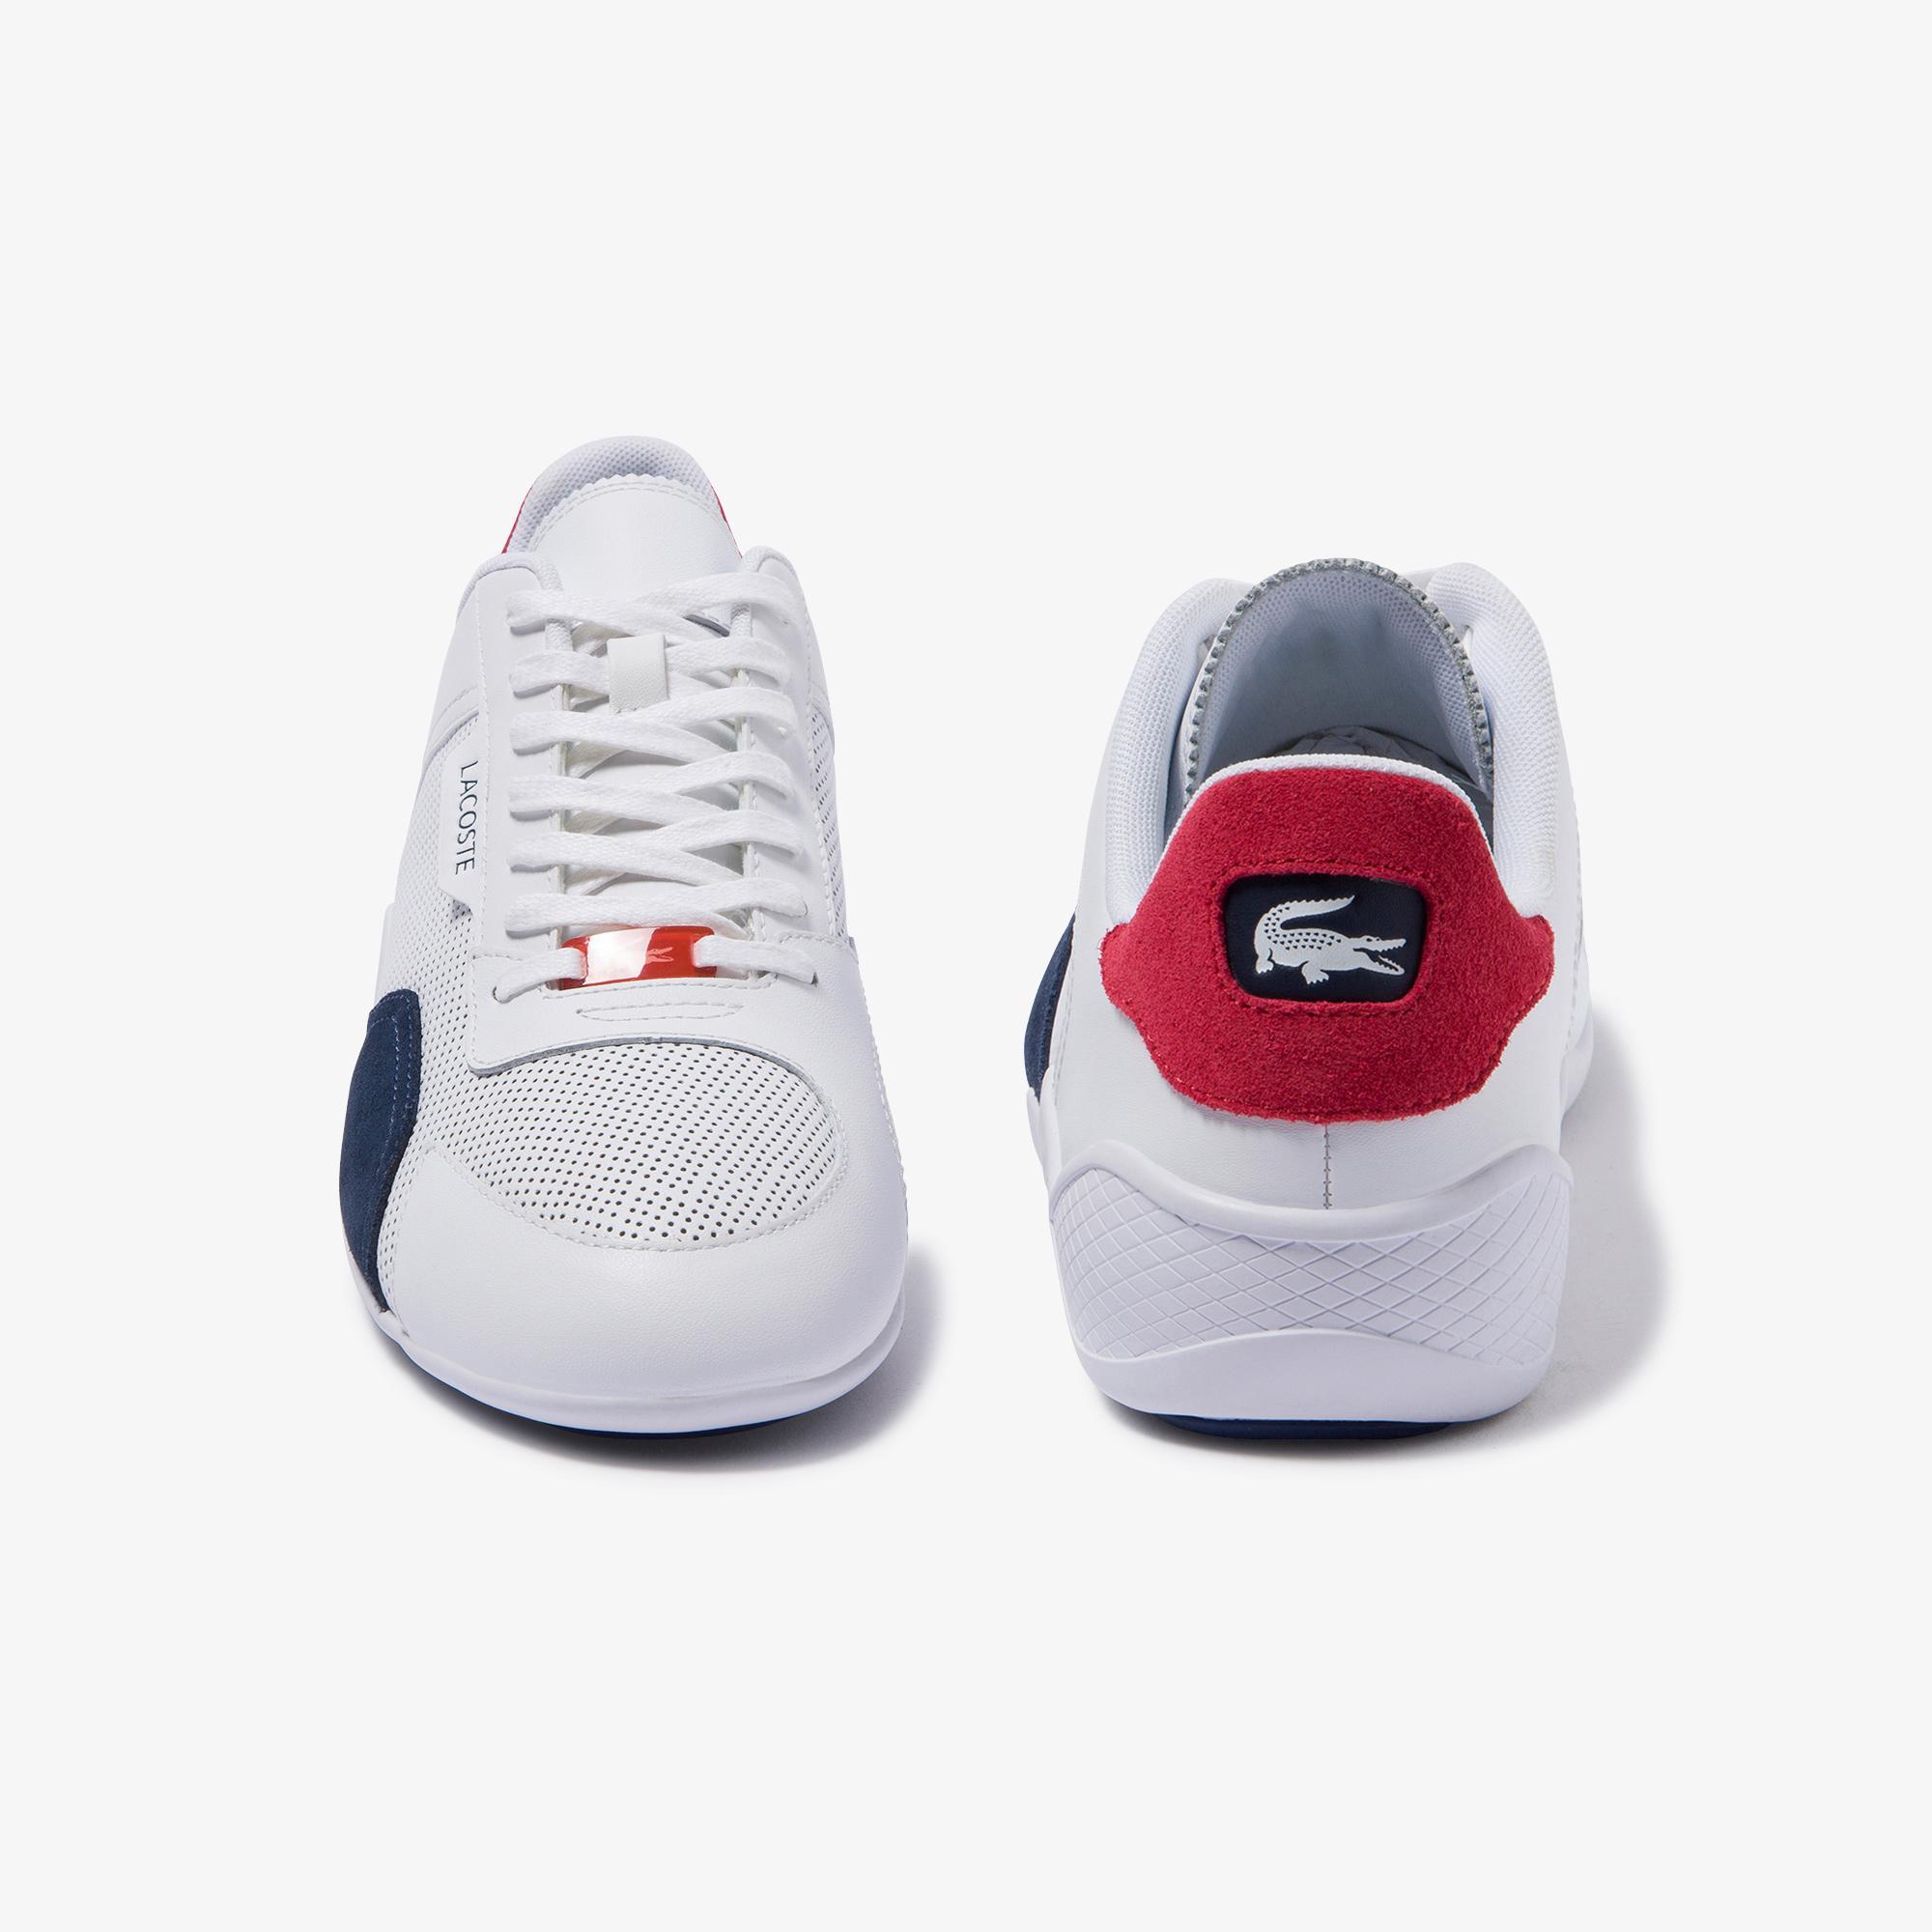 Lacoste Hapona 120 3 Men's Sneakers